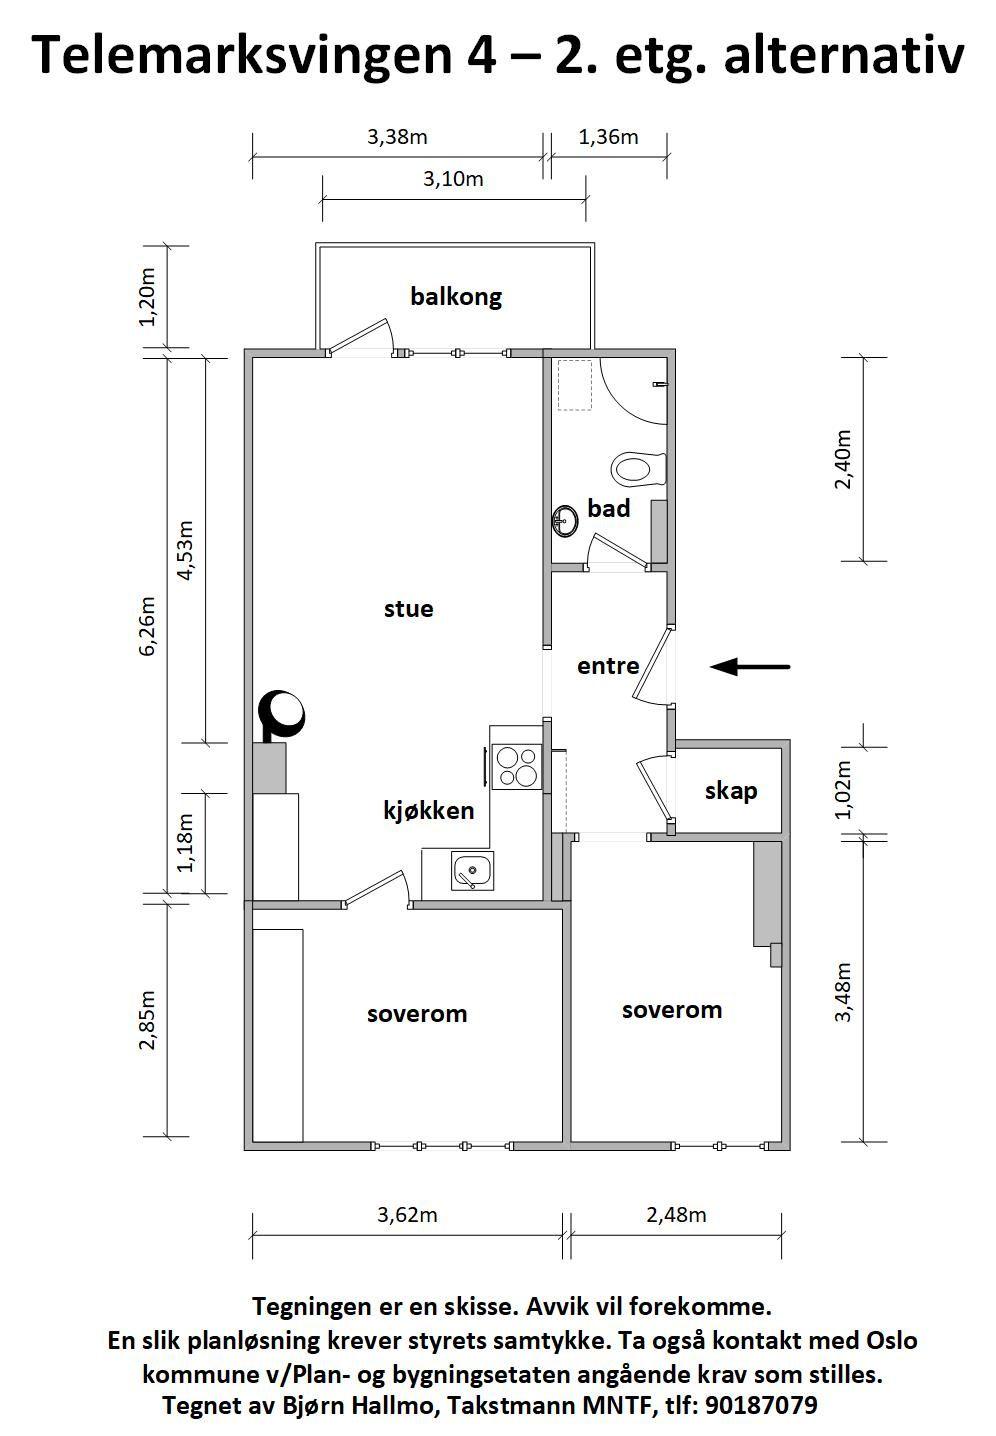 Telemarksvingen 4 - Alternativ plantegning som 3-roms -